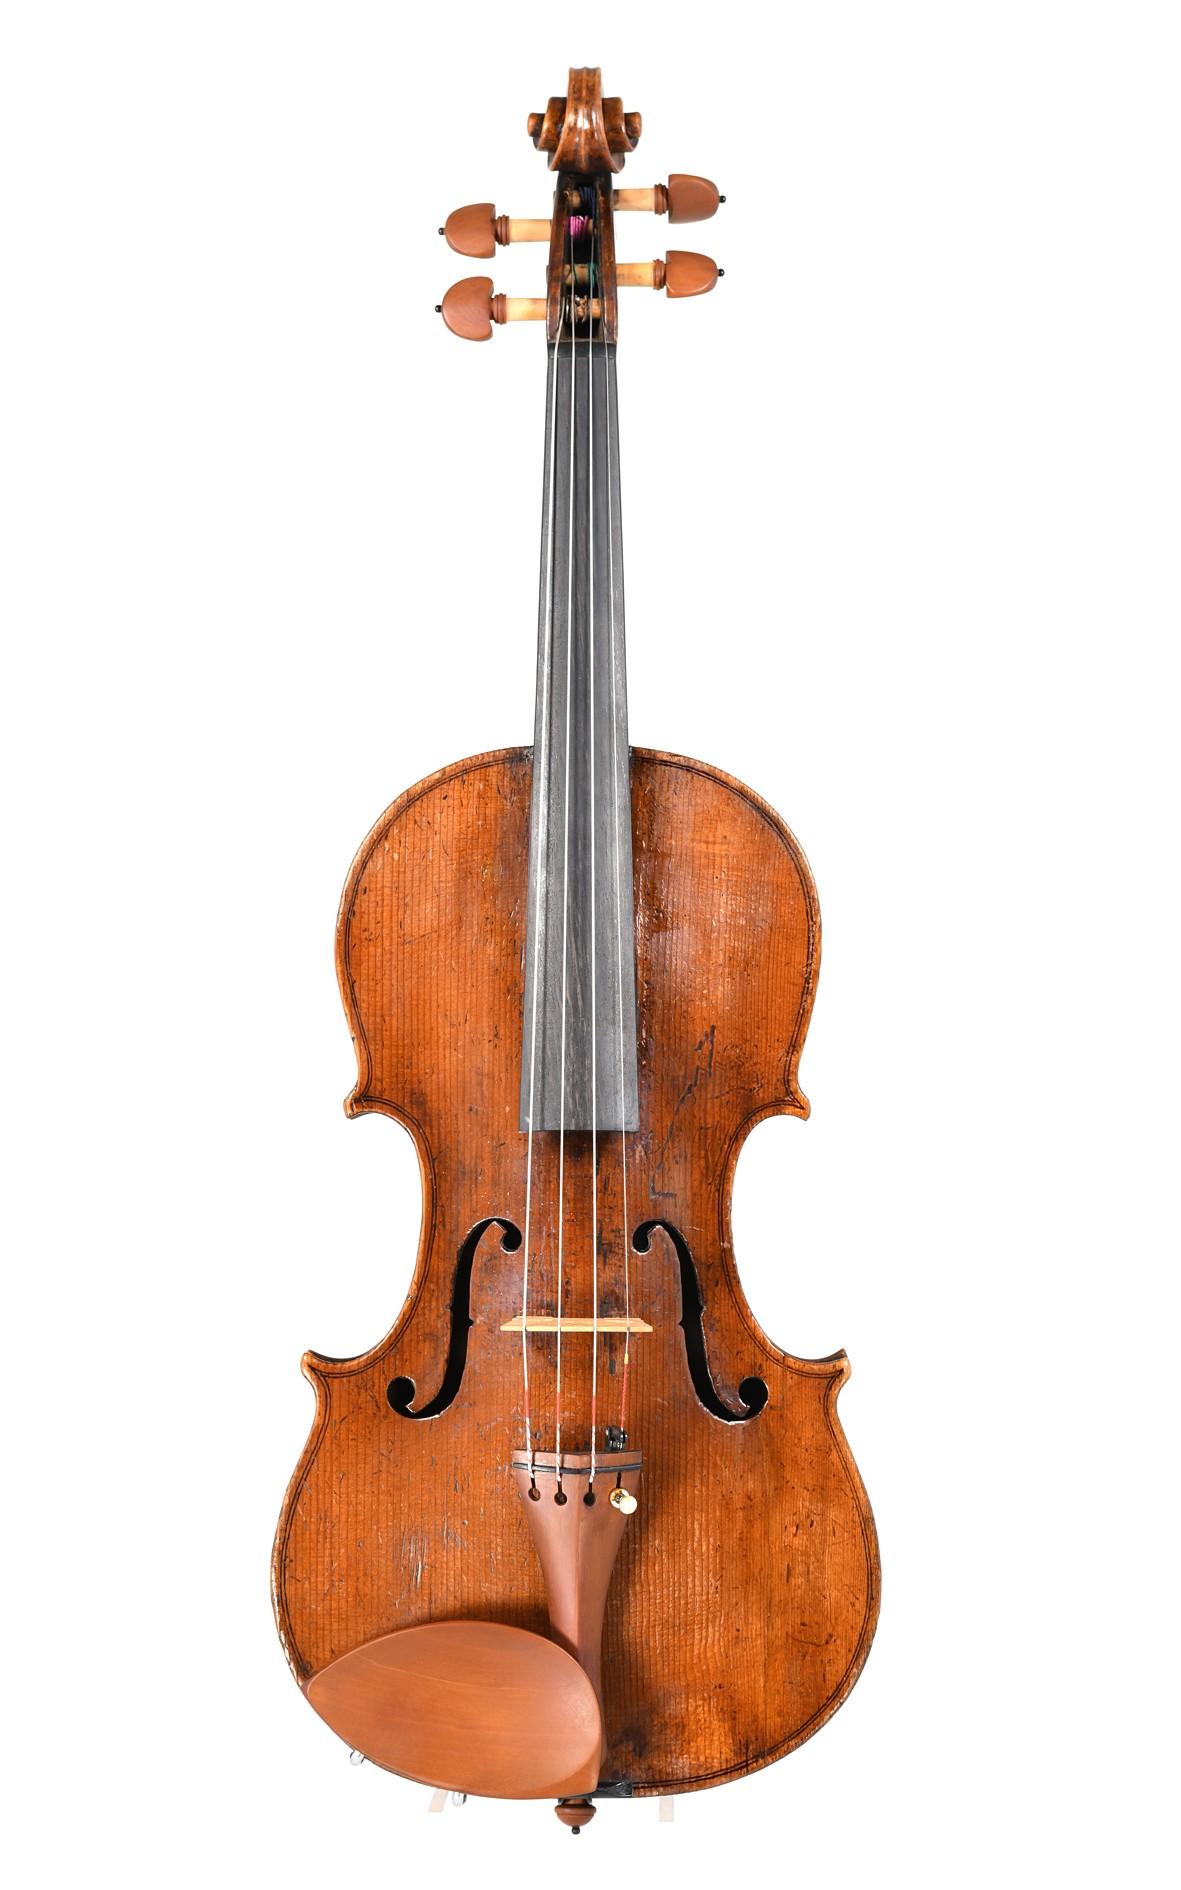 James Preston, English violin, late 18th century - top